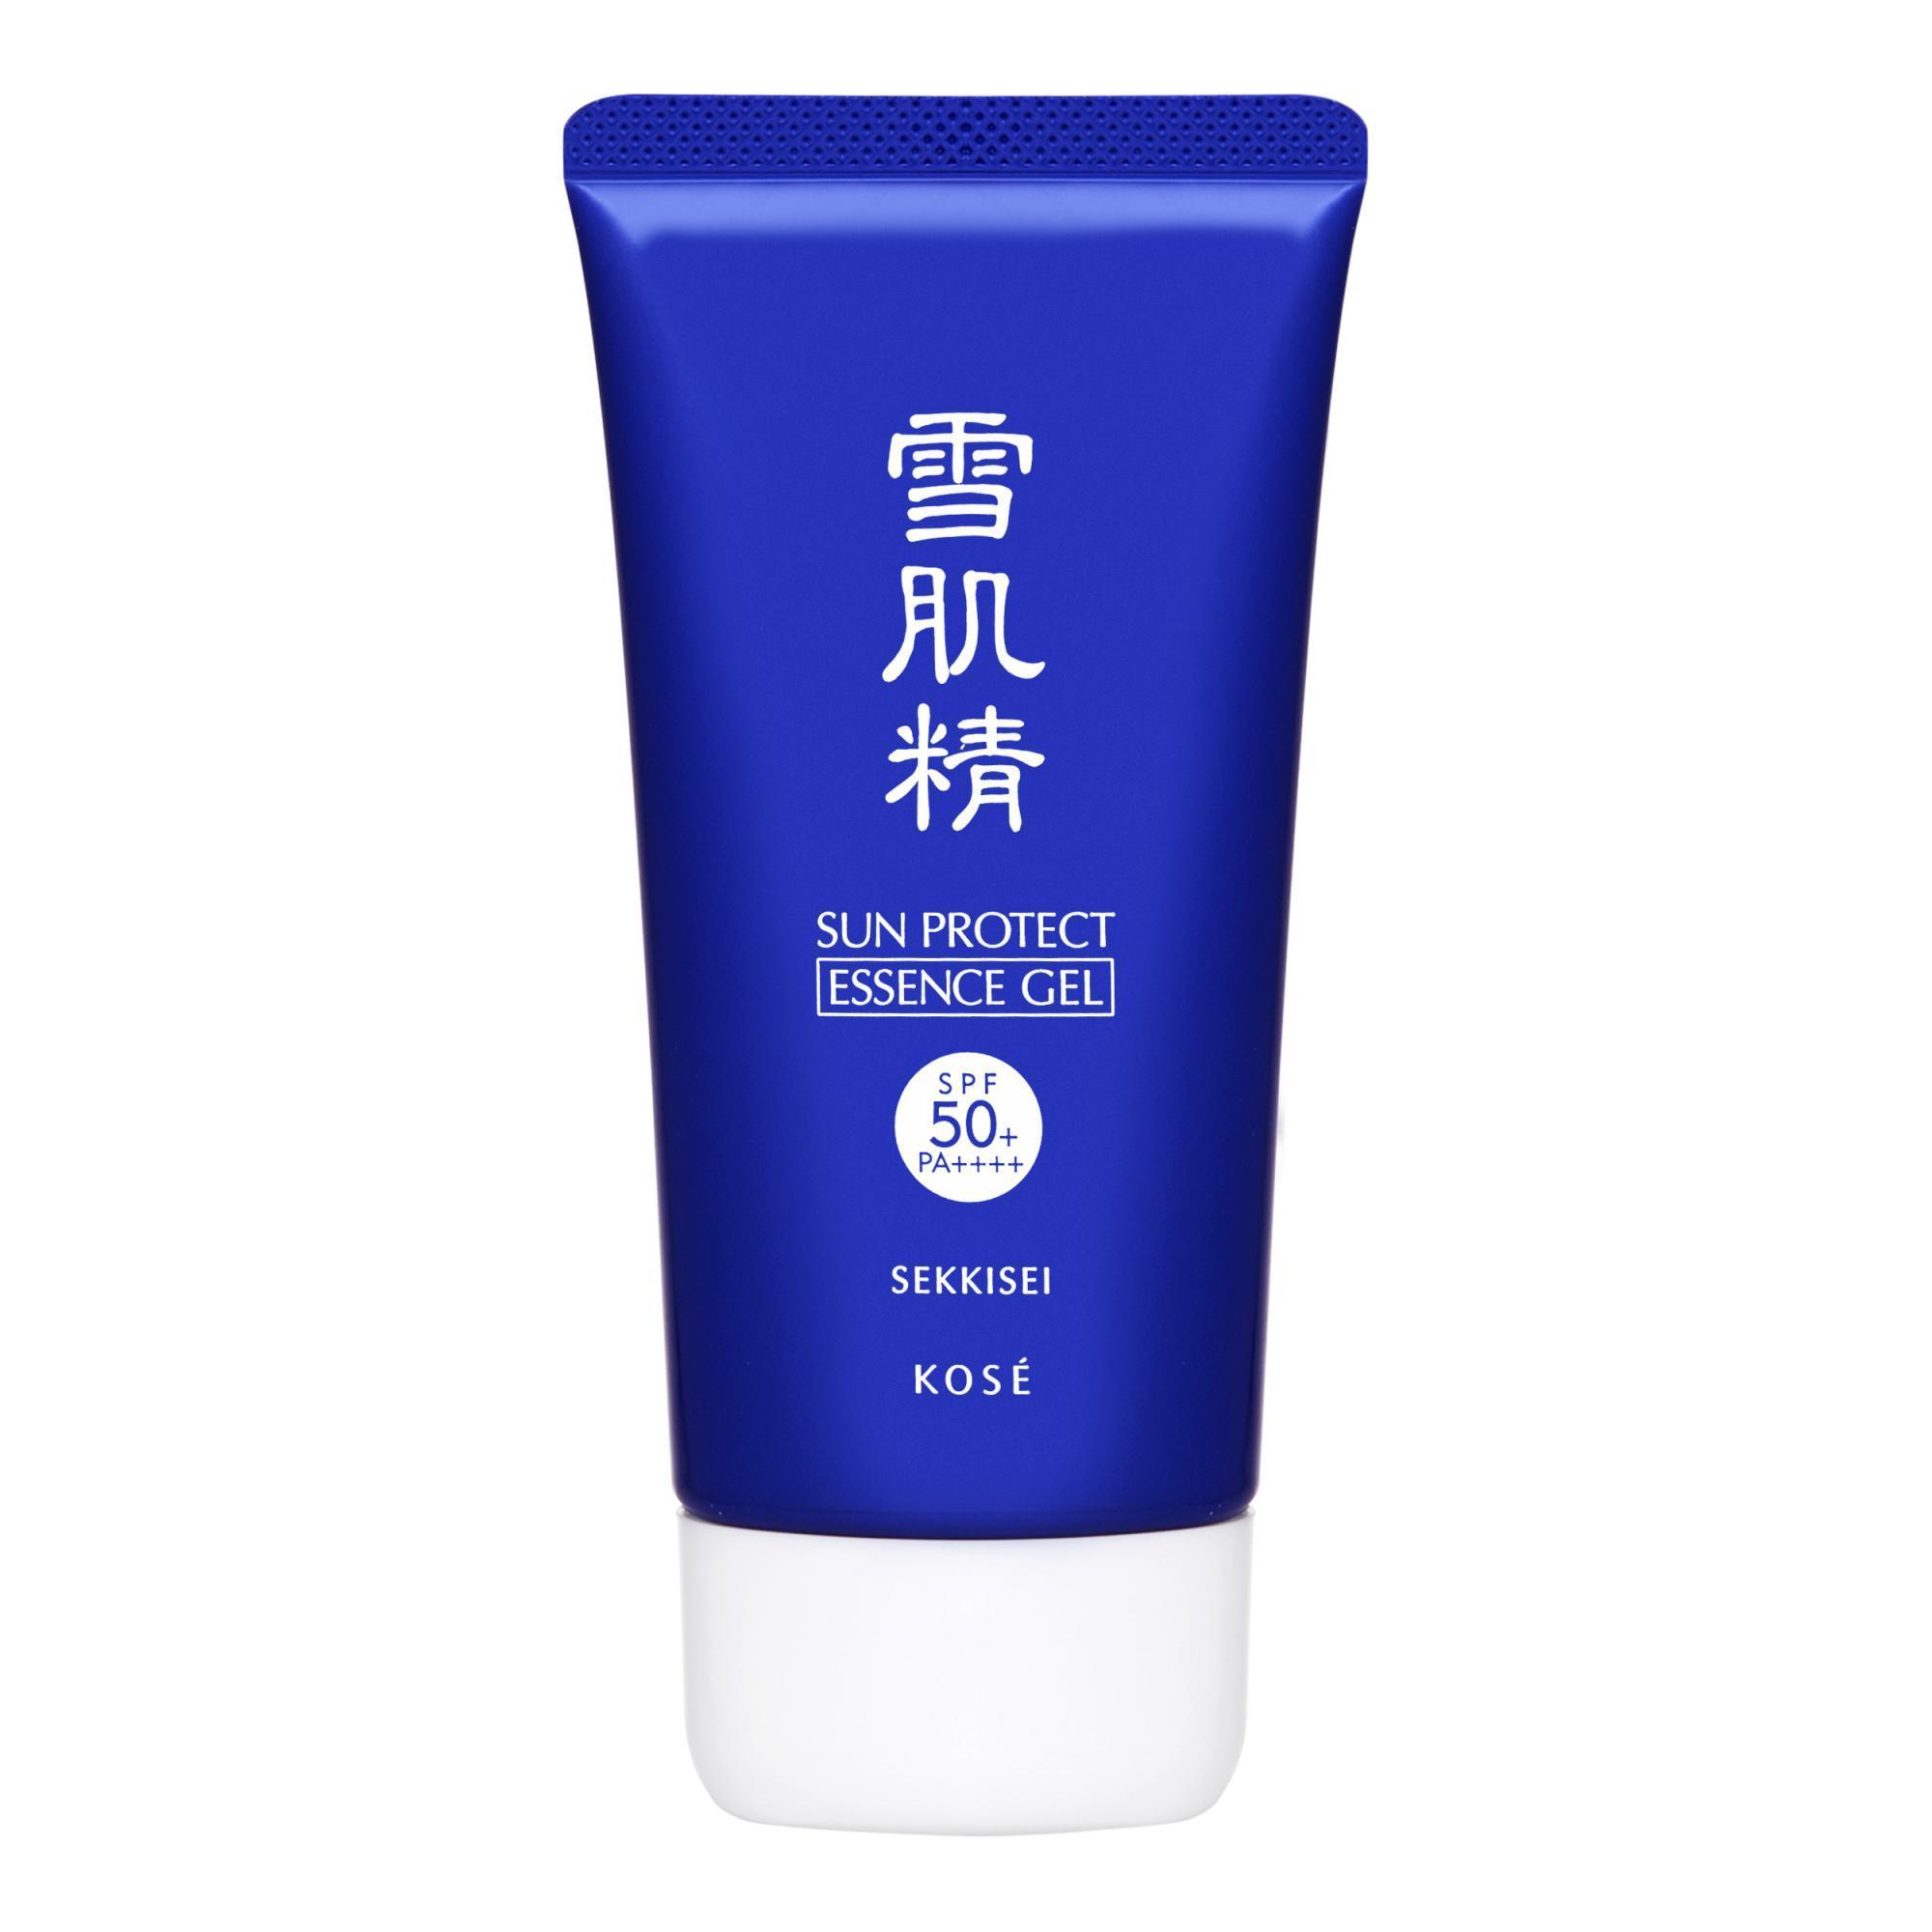 Review Kose Sekkisei Sun Protect Essence Gel N Spf50 Pa 81Ml 2 8Oz Intl Kose